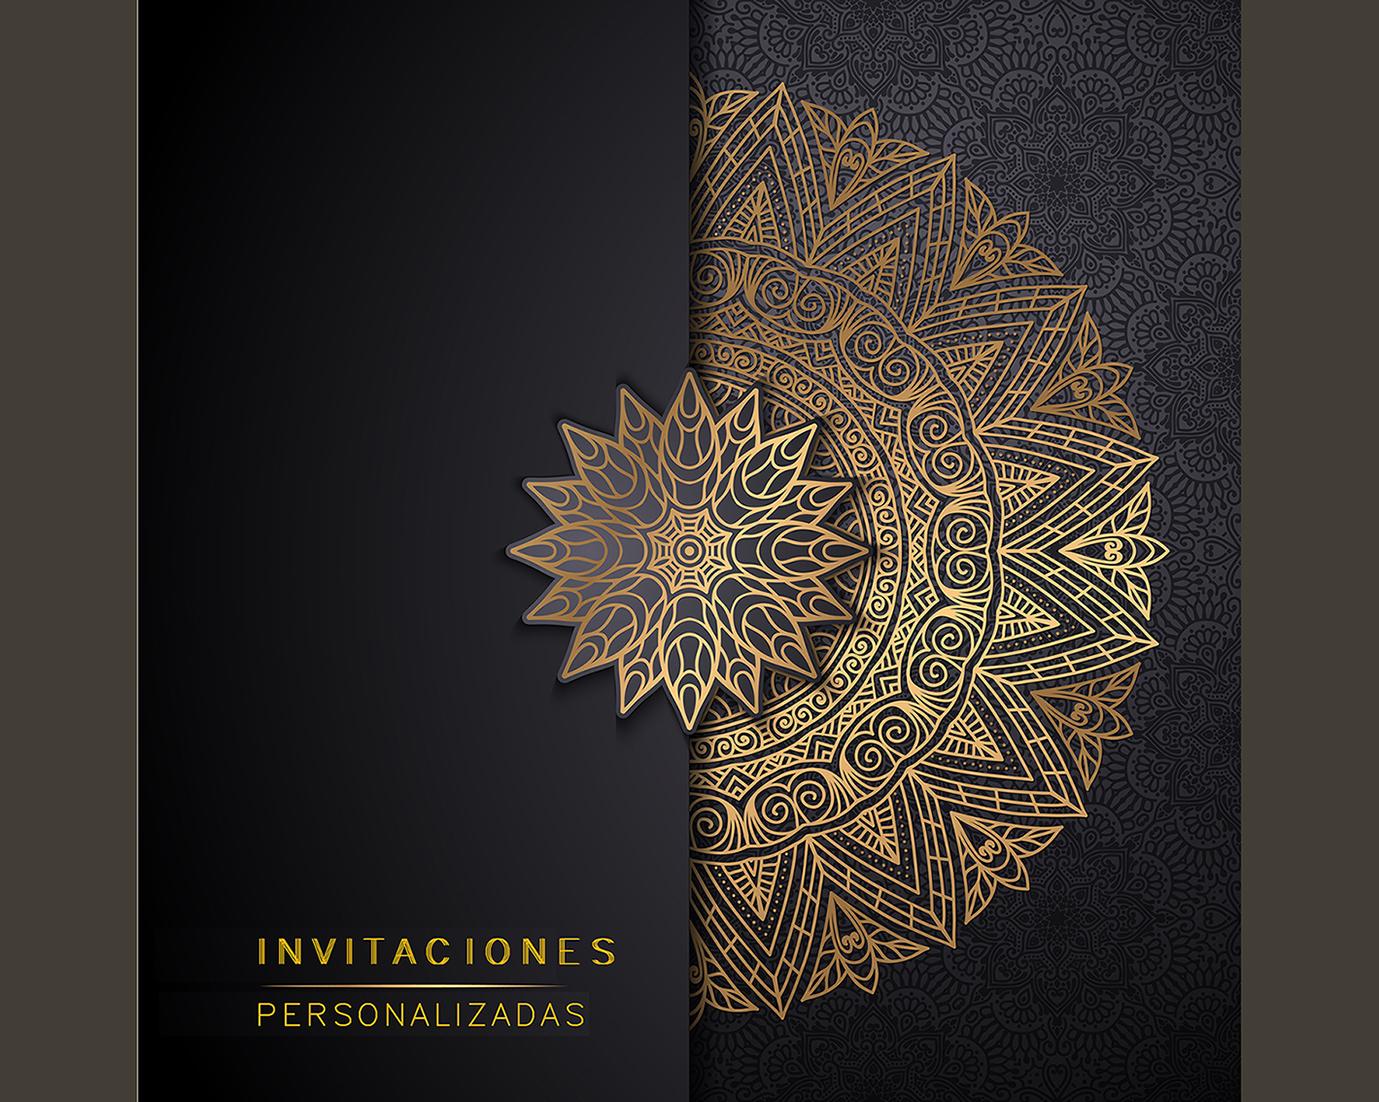 Impresion-invitaciones